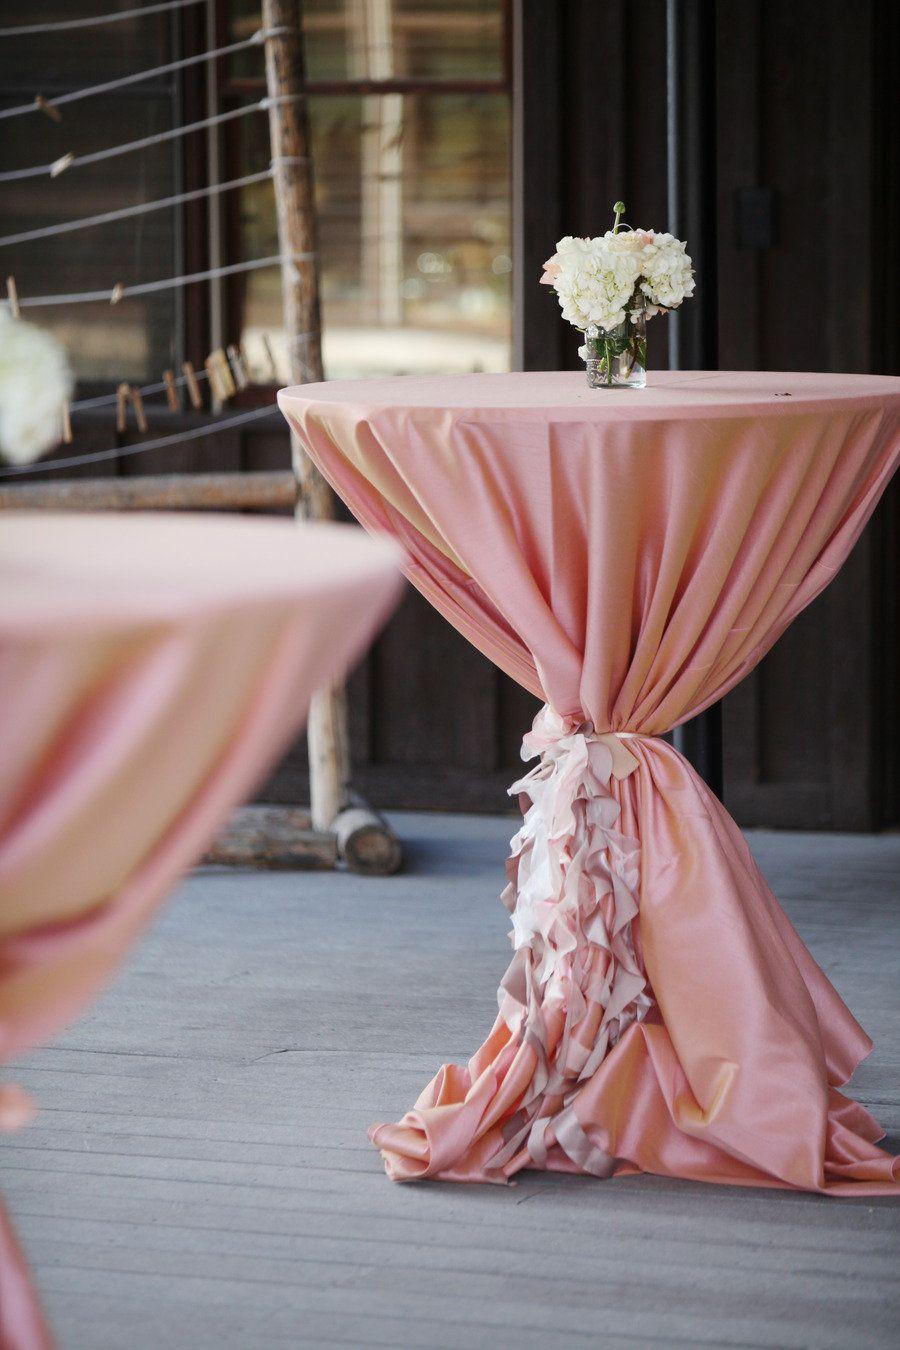 Wedding Cocktail Hour Decor Table Design Linens